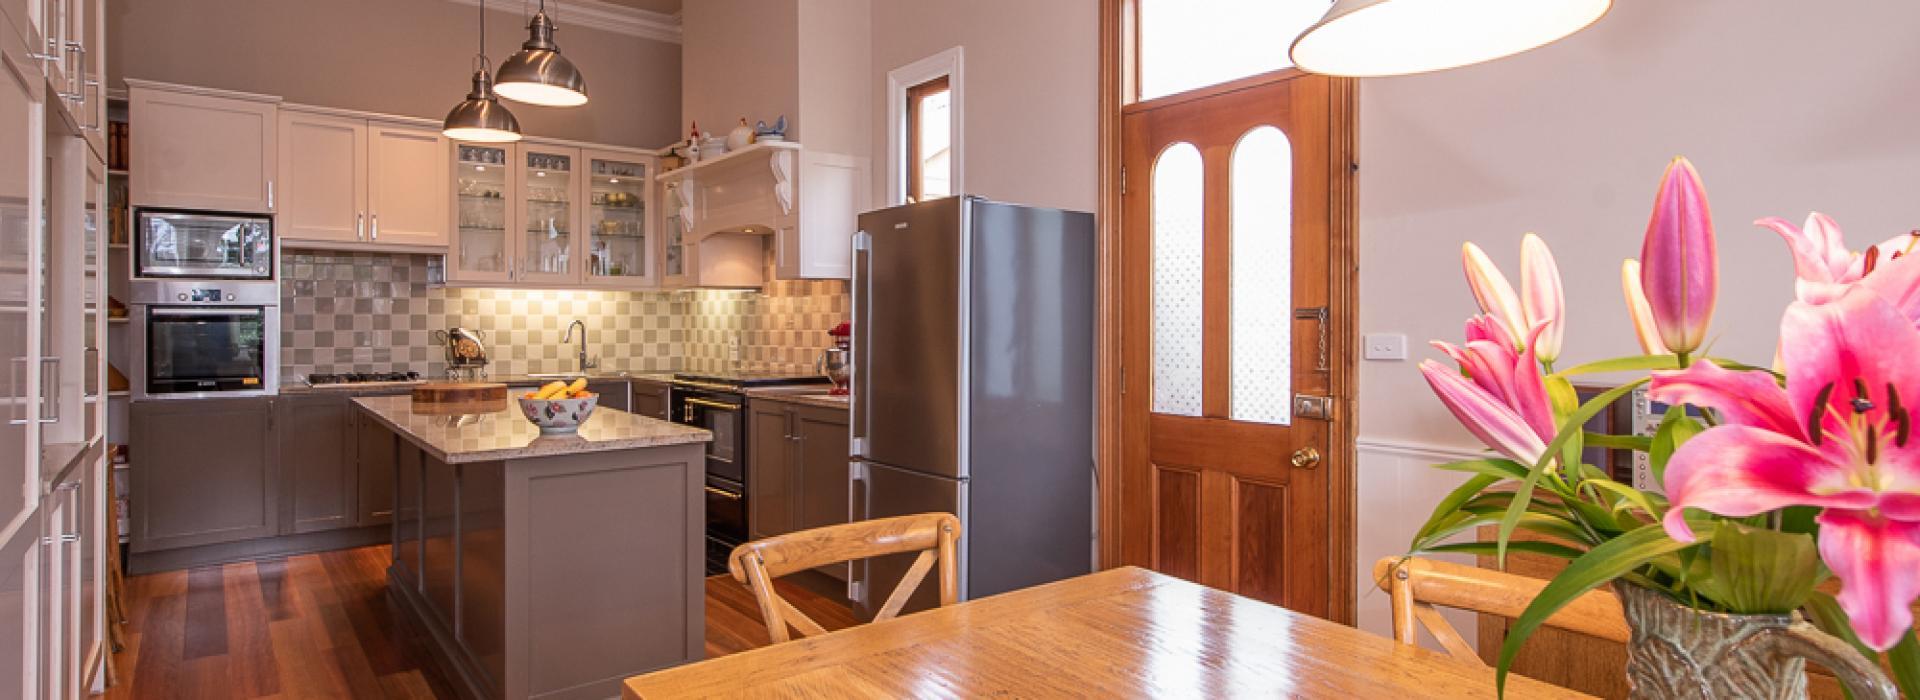 Flanagan Residential | For Sale | Paul Flanagan | Trevallyn